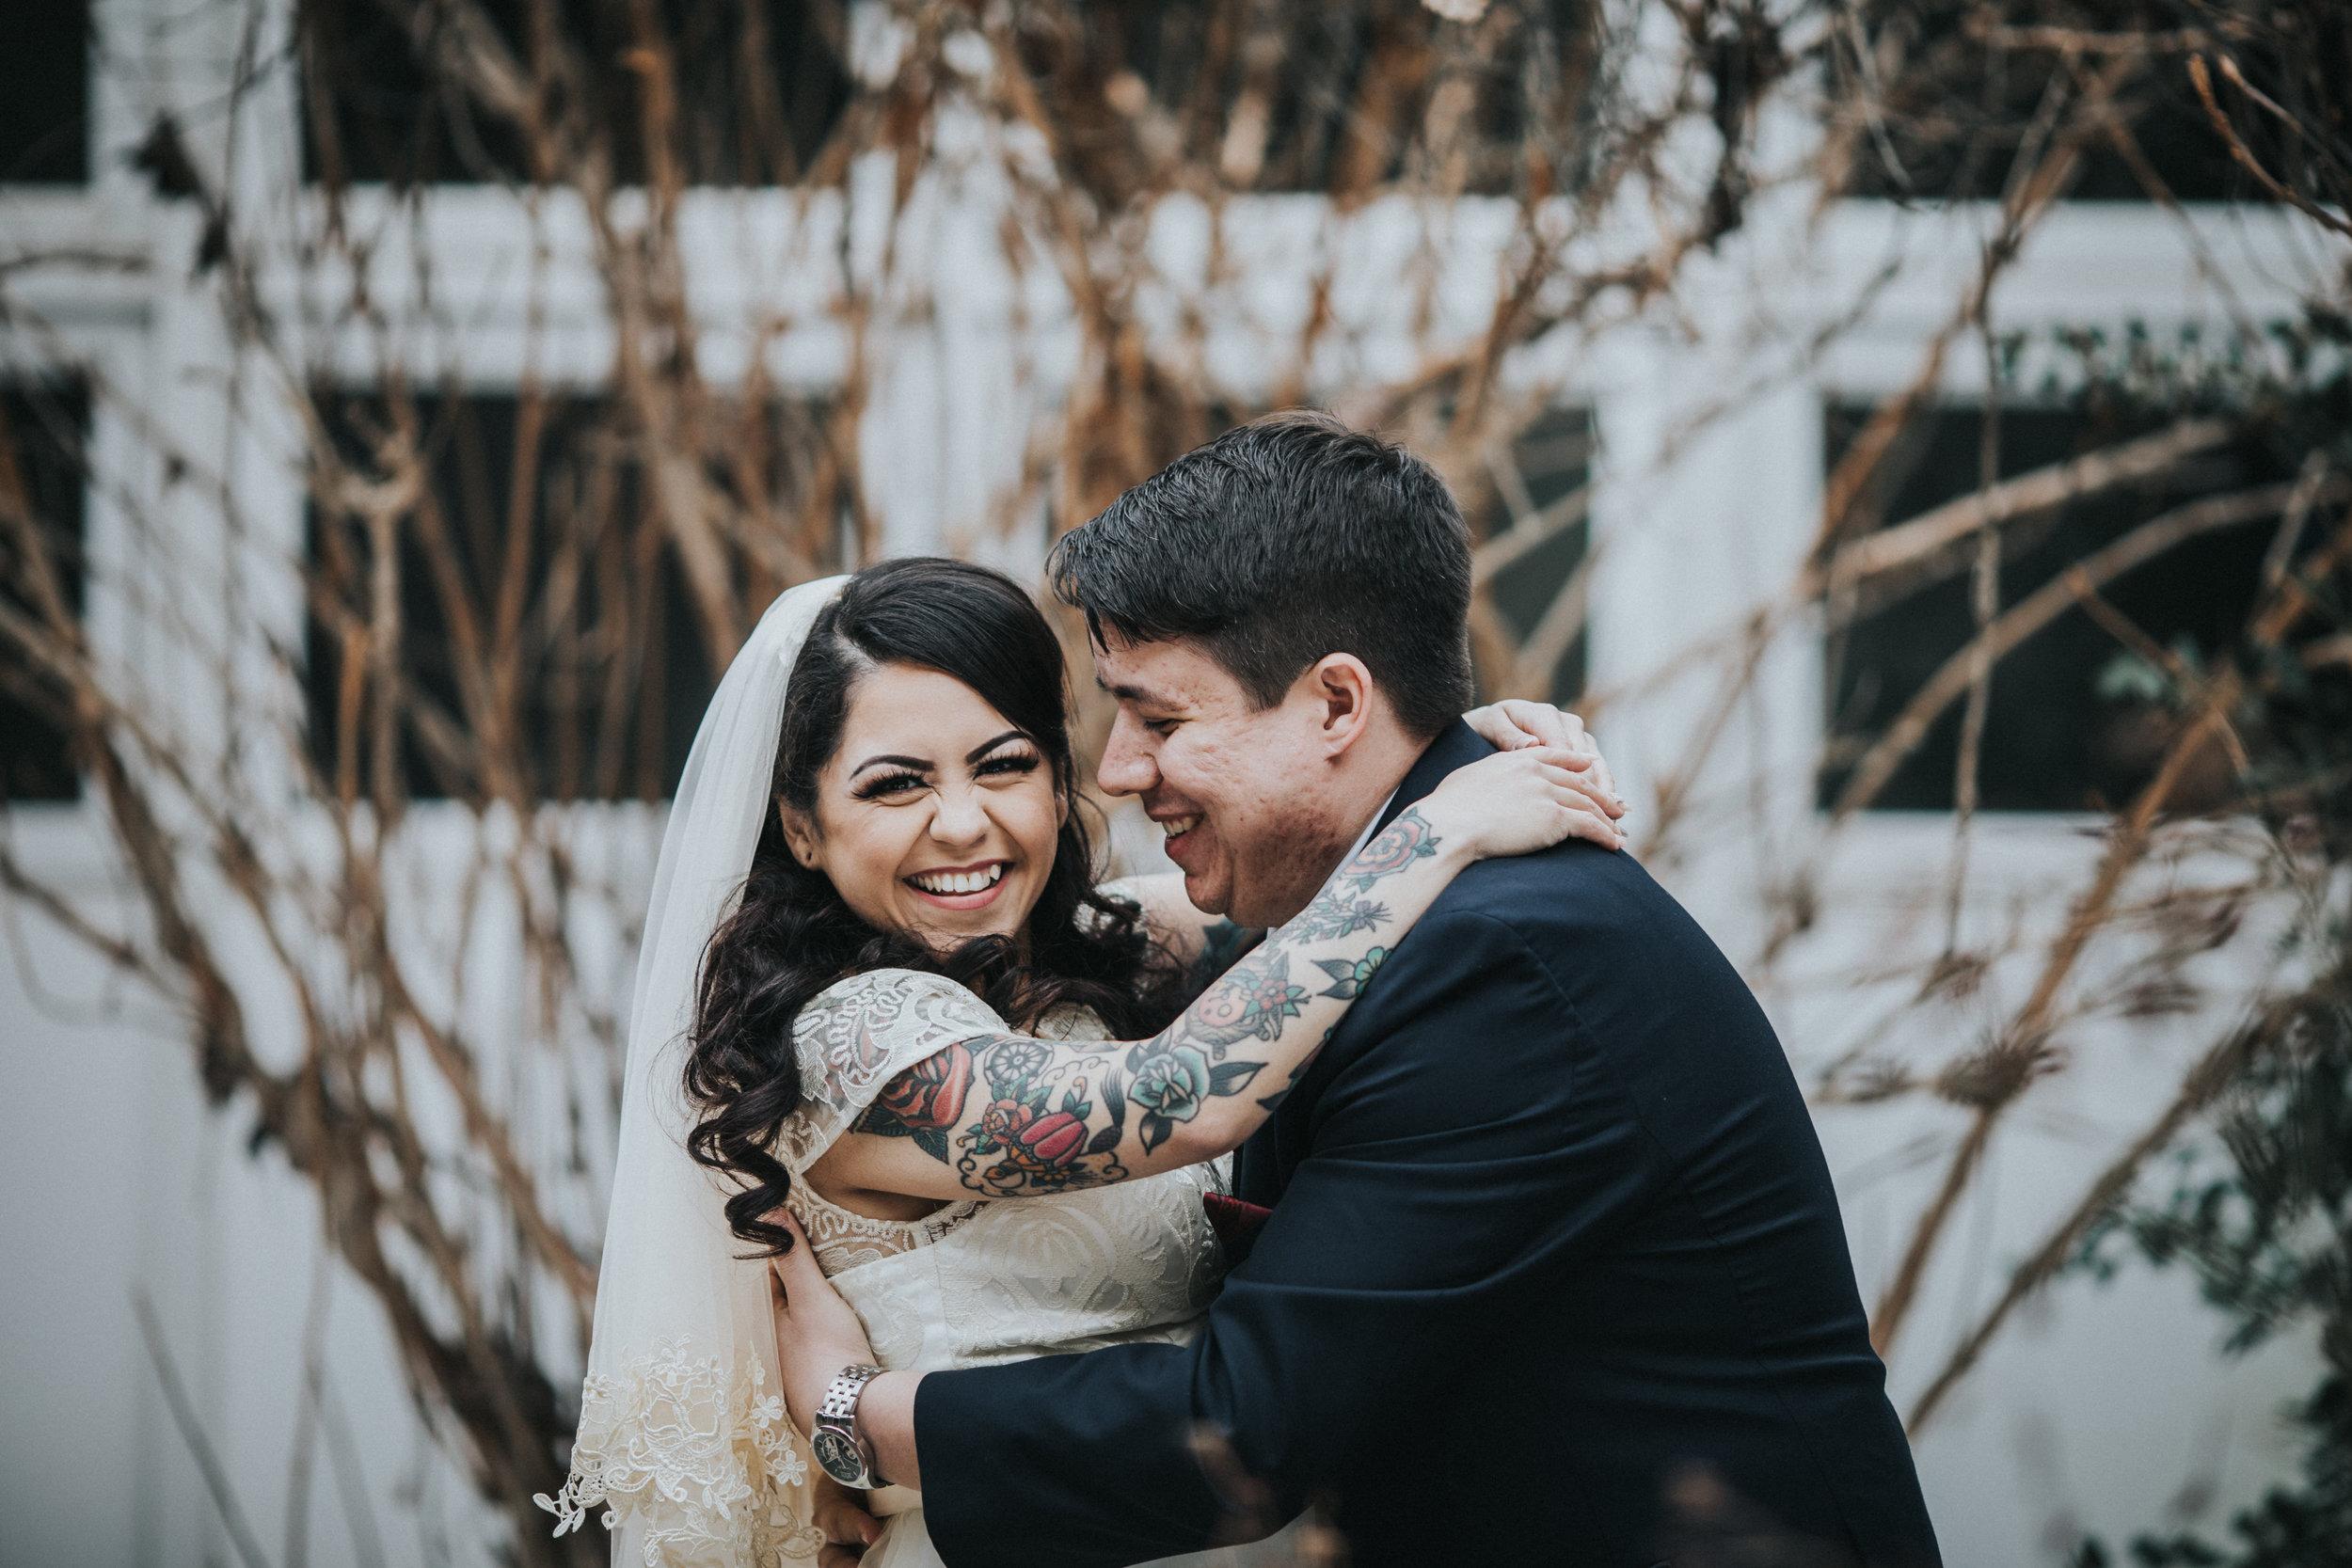 New-Jersey-Wedding-Photographer-ReceptionCenter-Valeria&Mike-First-Look-Bride&Groom (44 of 69).jpg